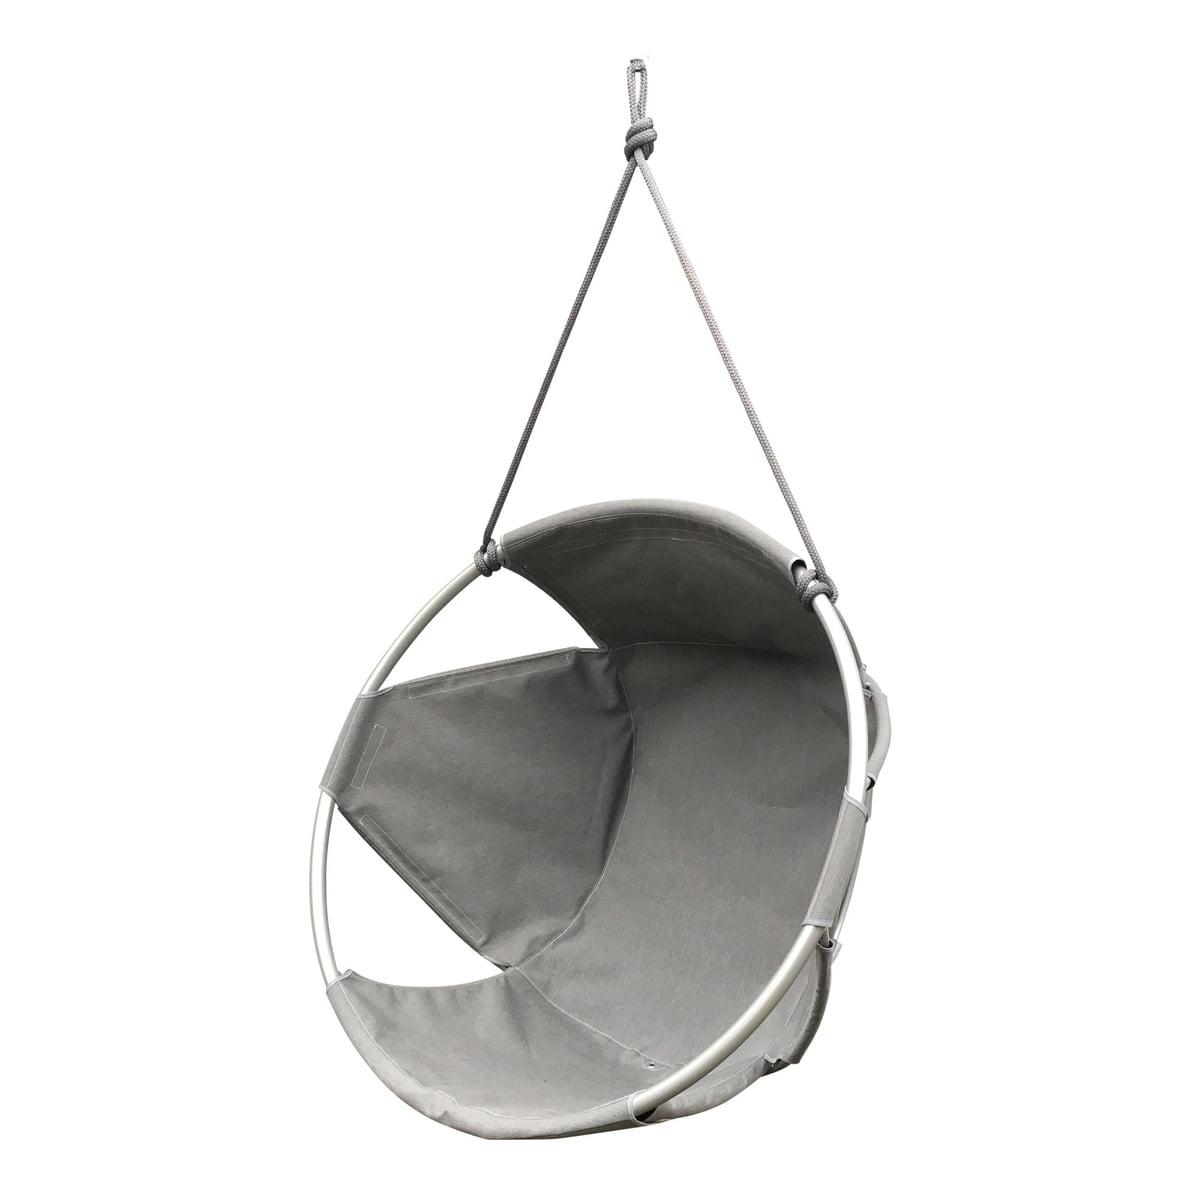 outdoor sessel cocoon von trimm copenhagen. Black Bedroom Furniture Sets. Home Design Ideas